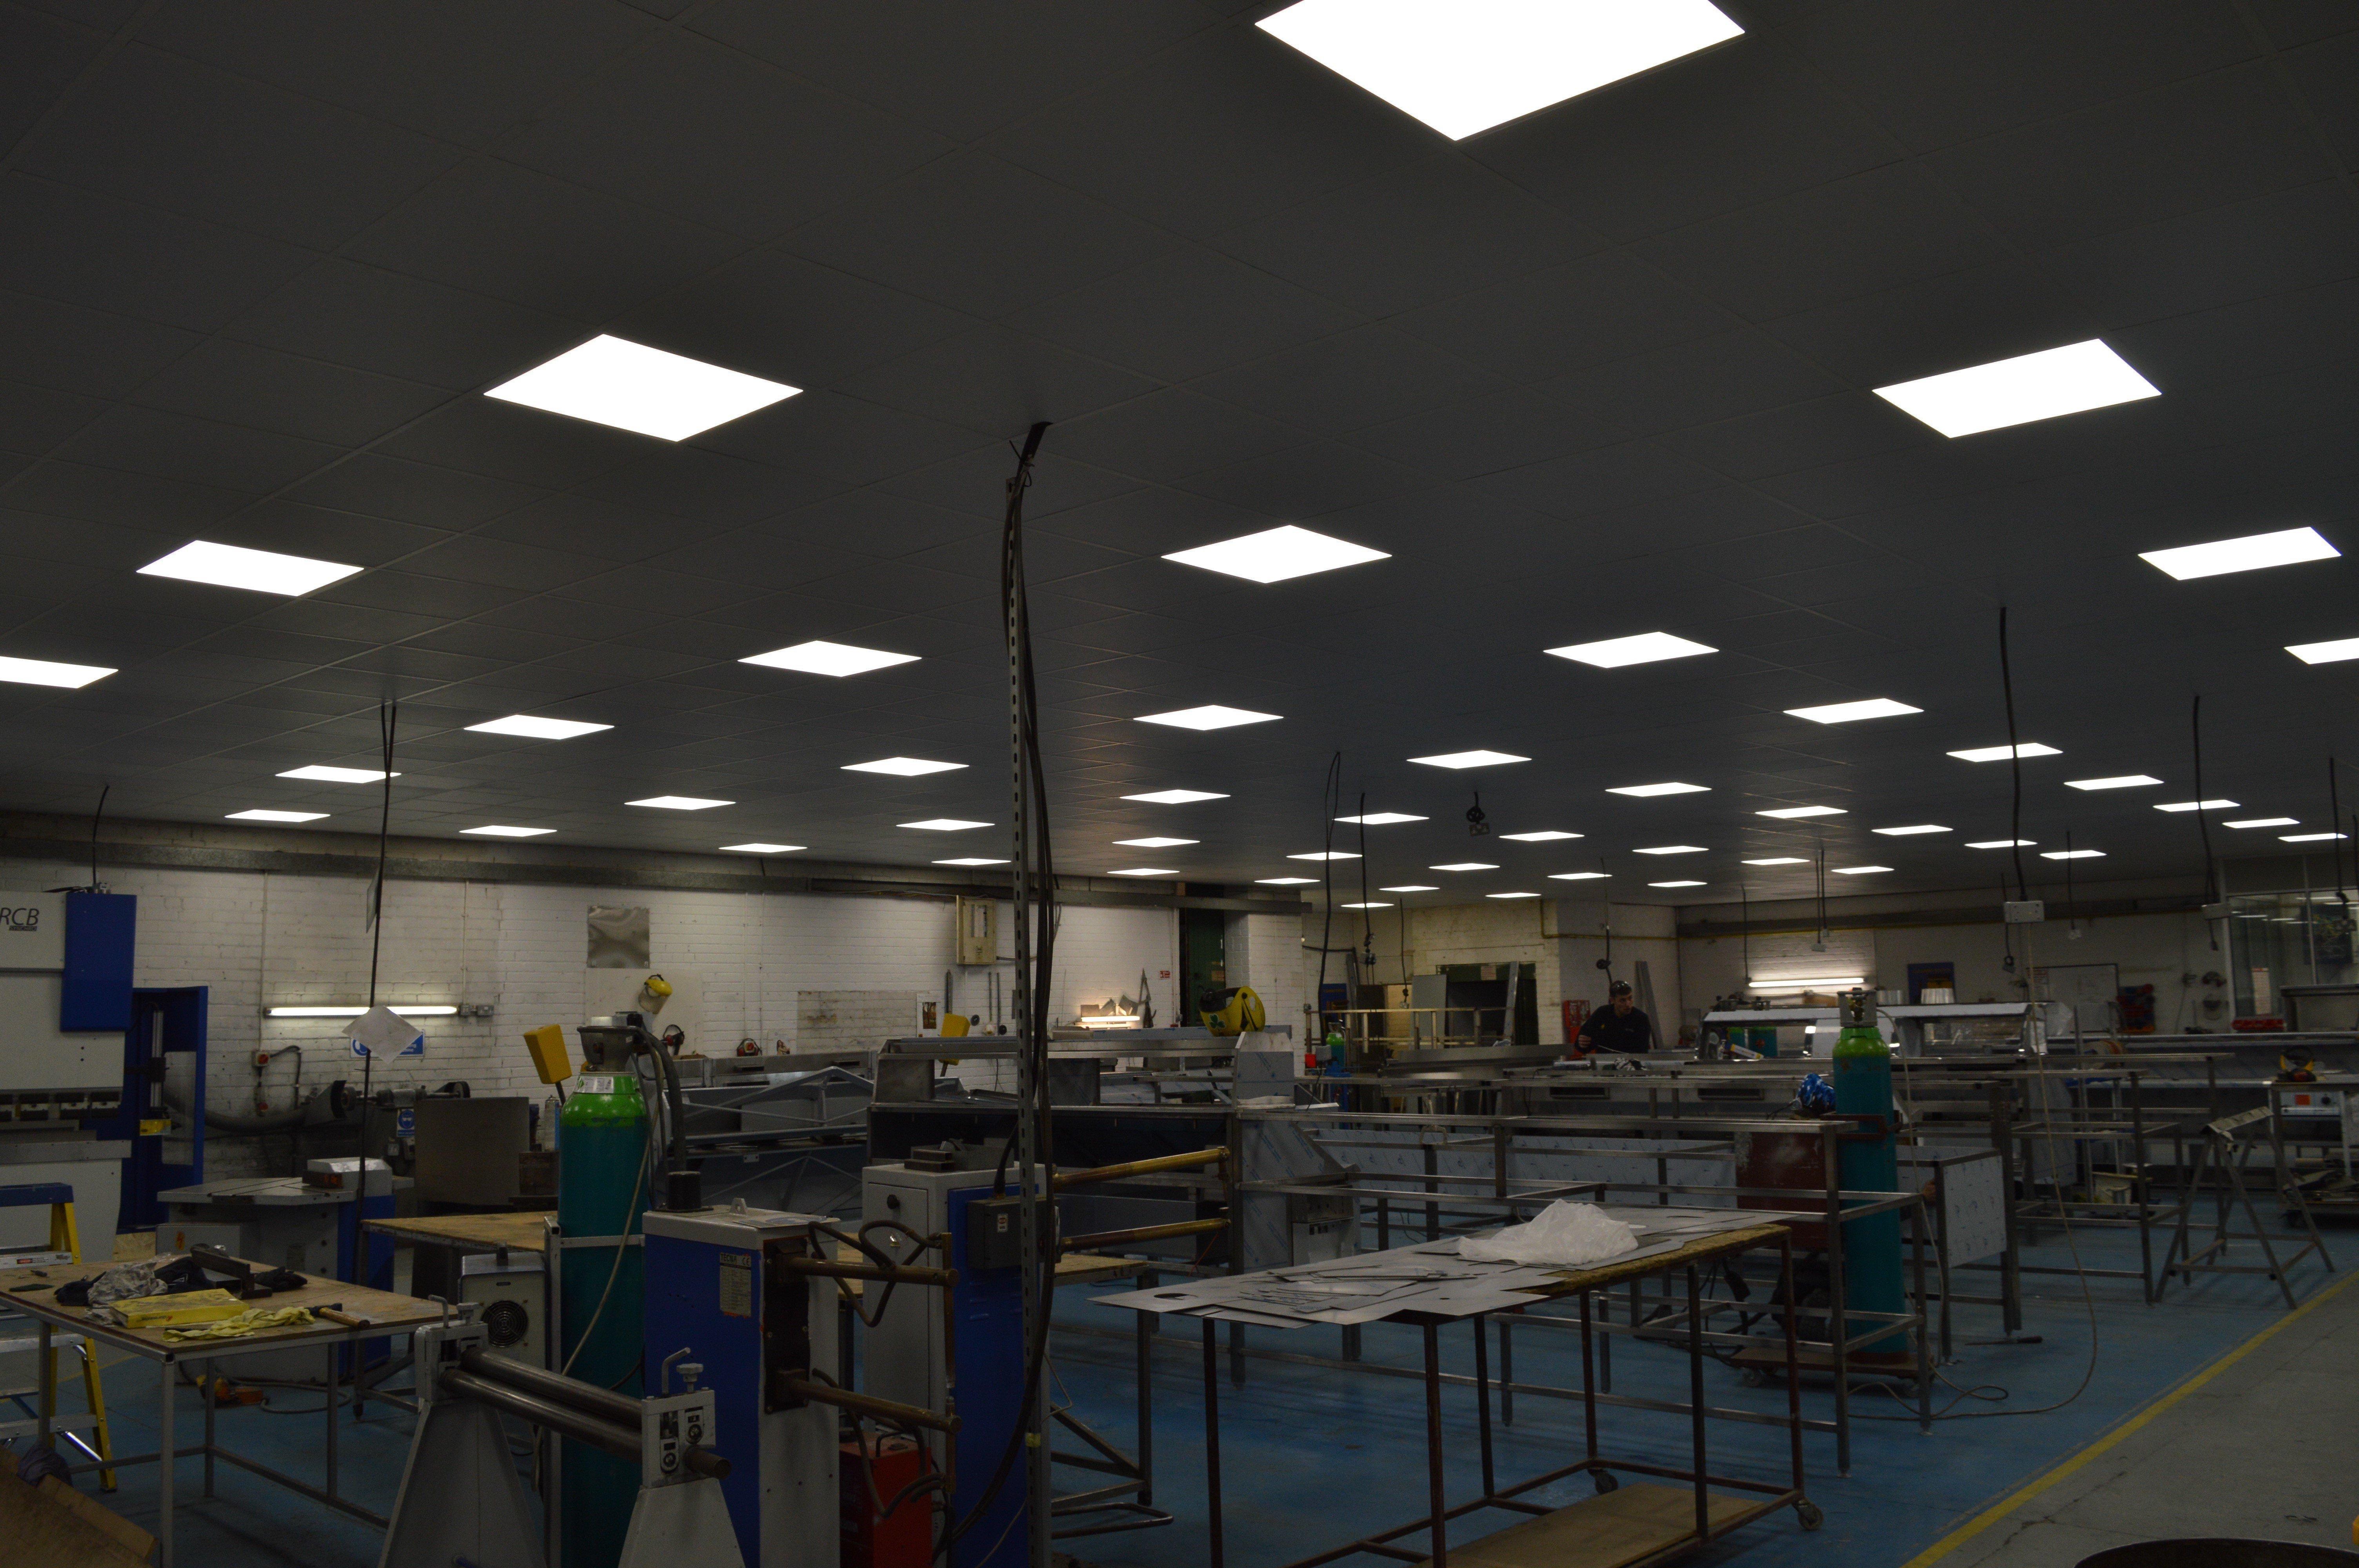 Suspended ceiling installation in progress